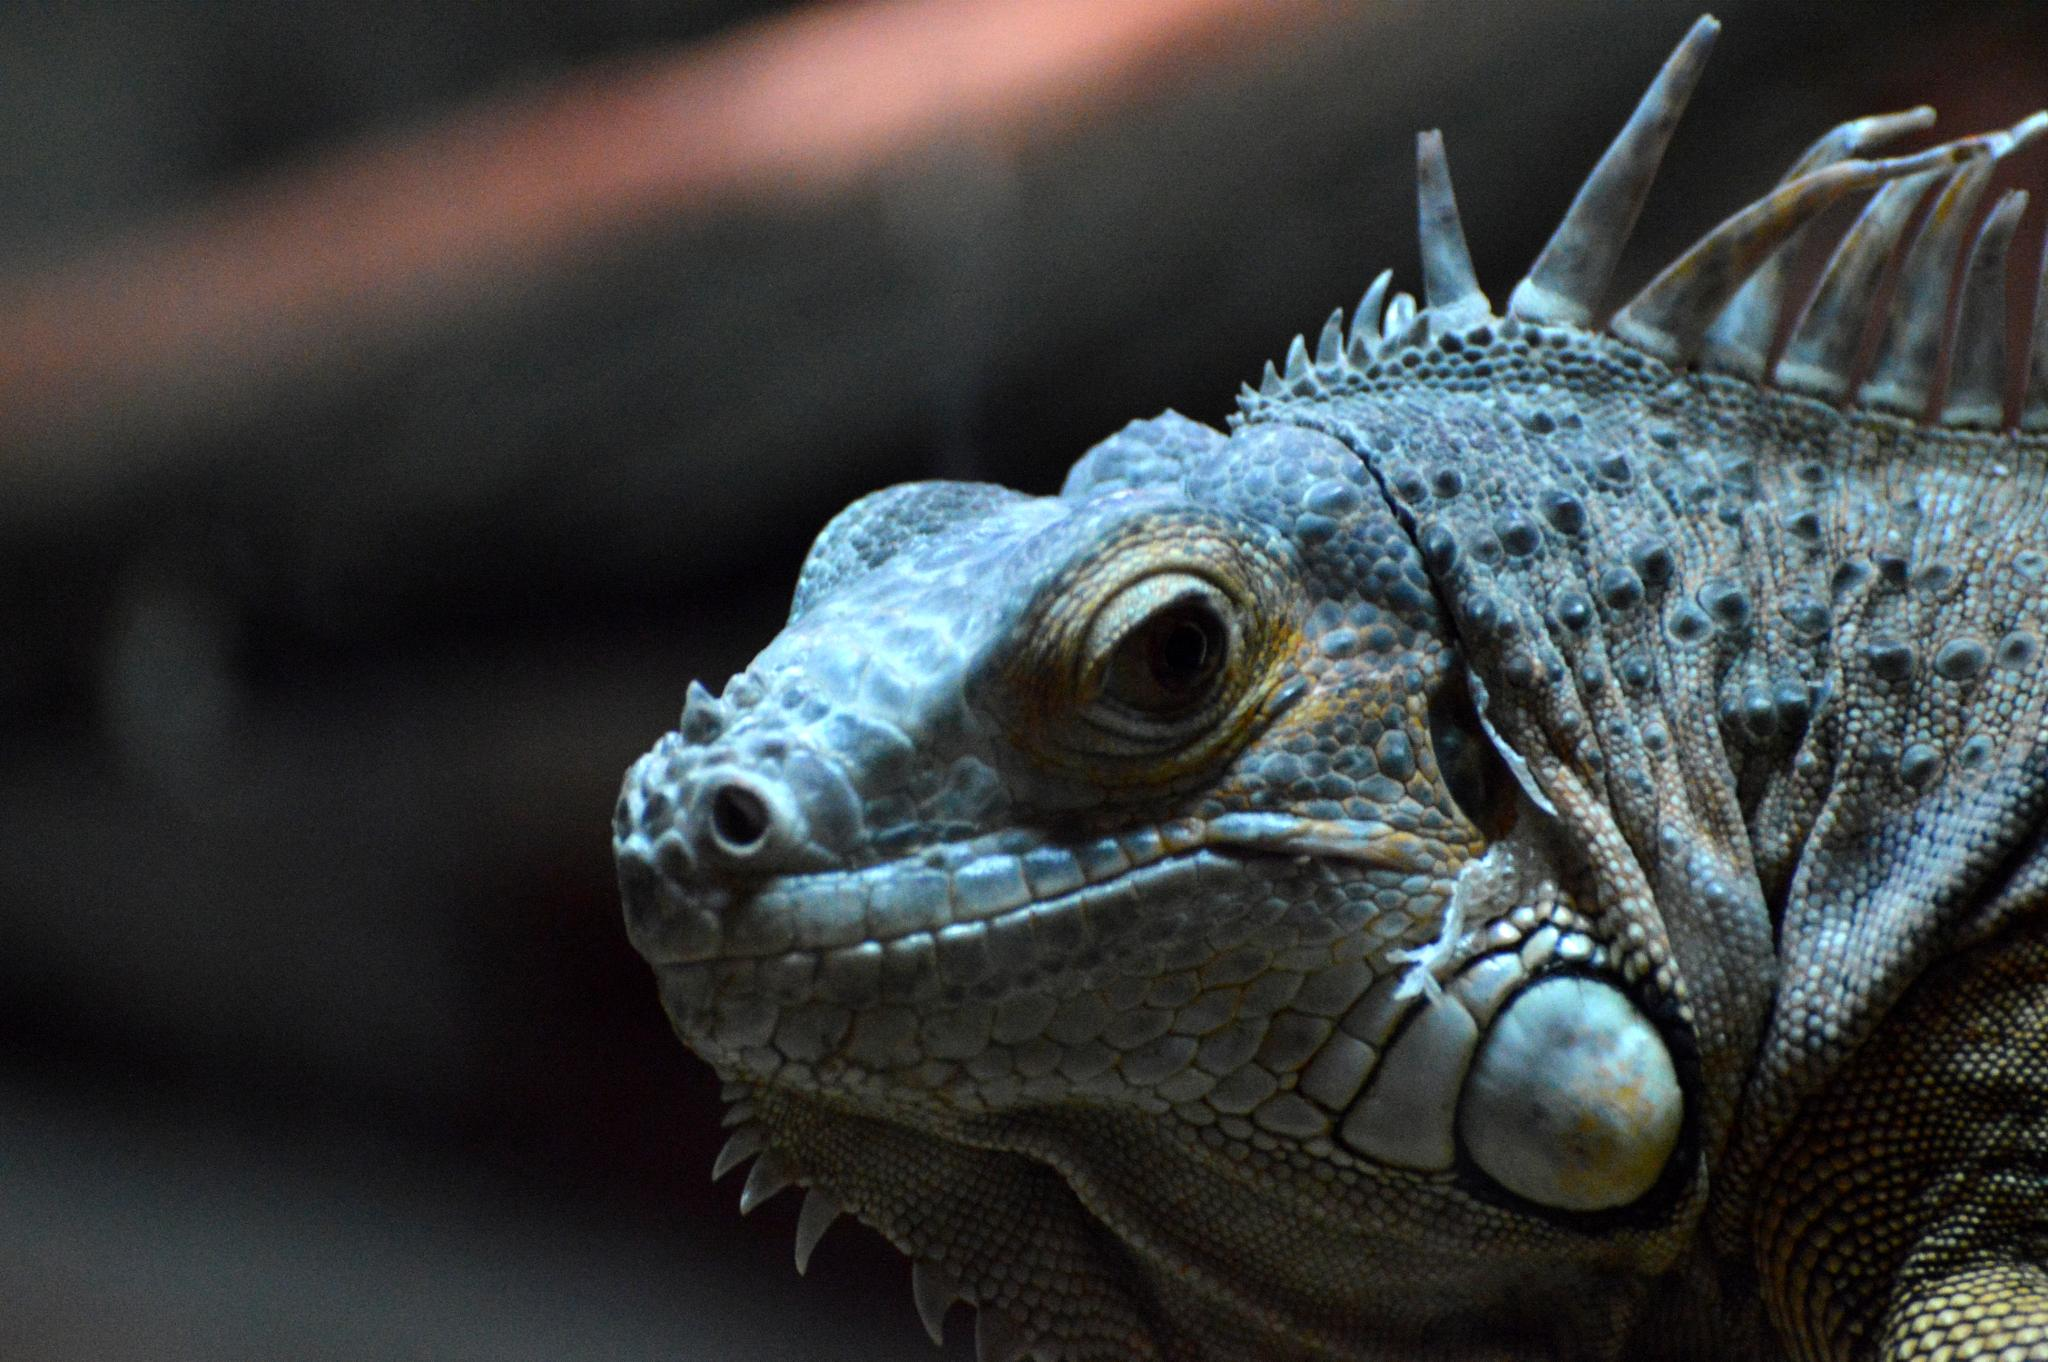 iguana #2 by Hermine Makaryan